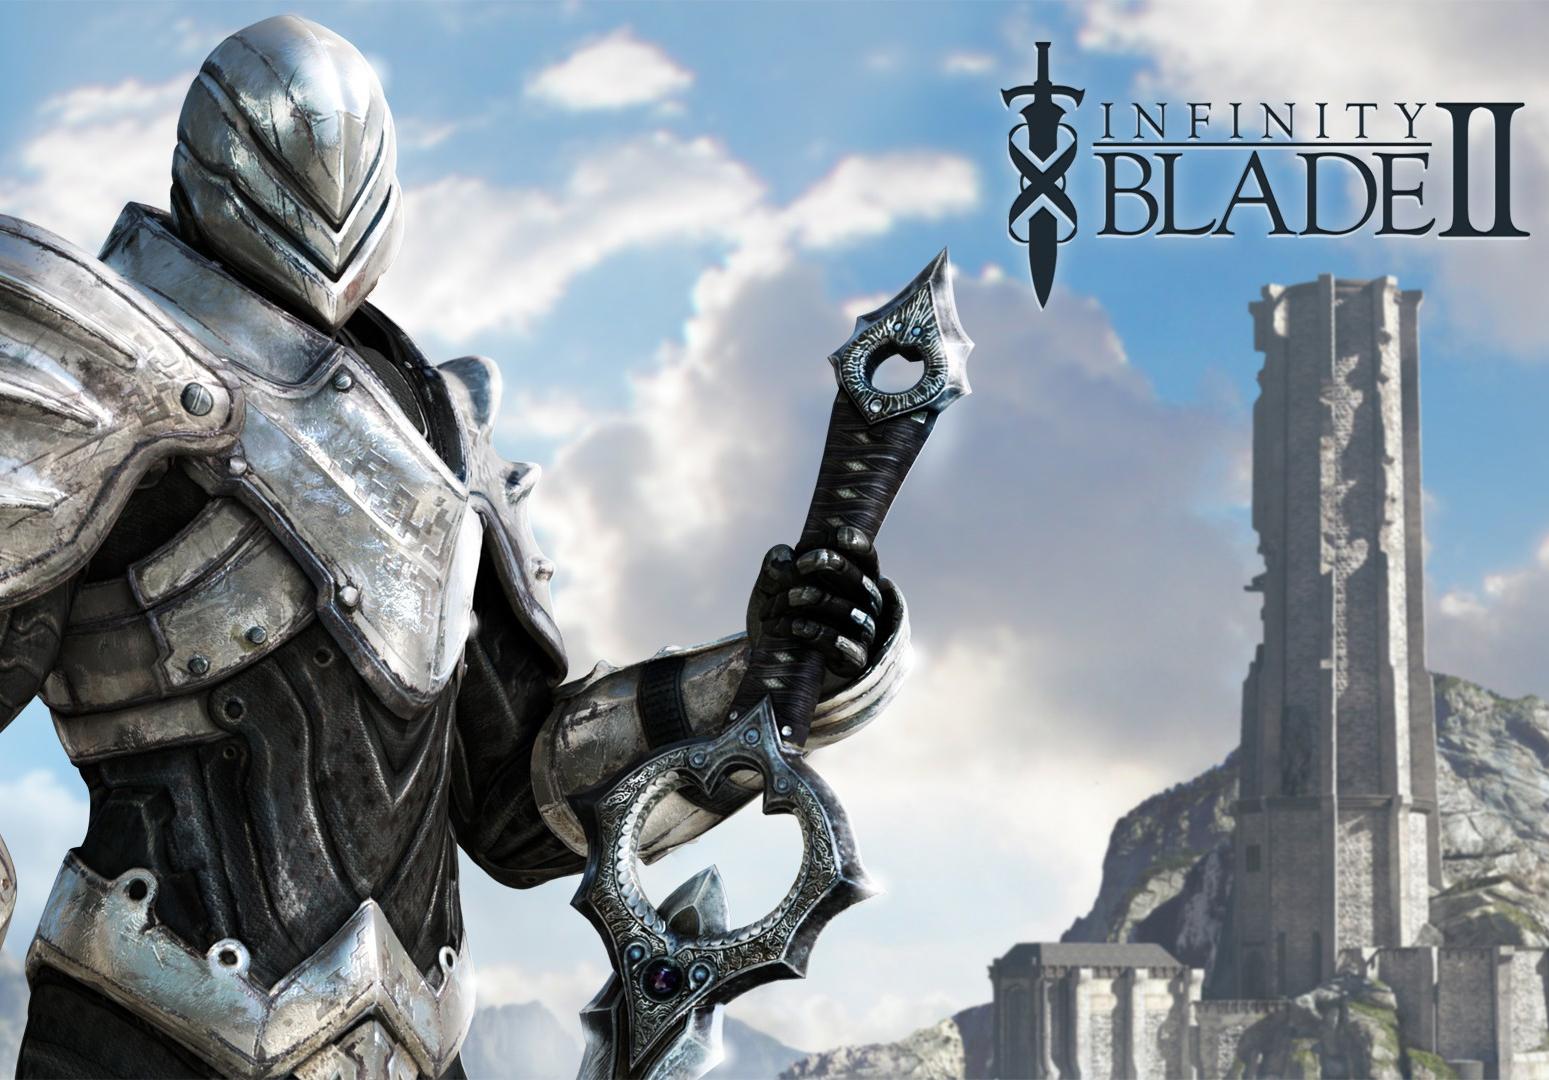 Infinity Blade 2 Wallpaper infinity blade 1549x1080